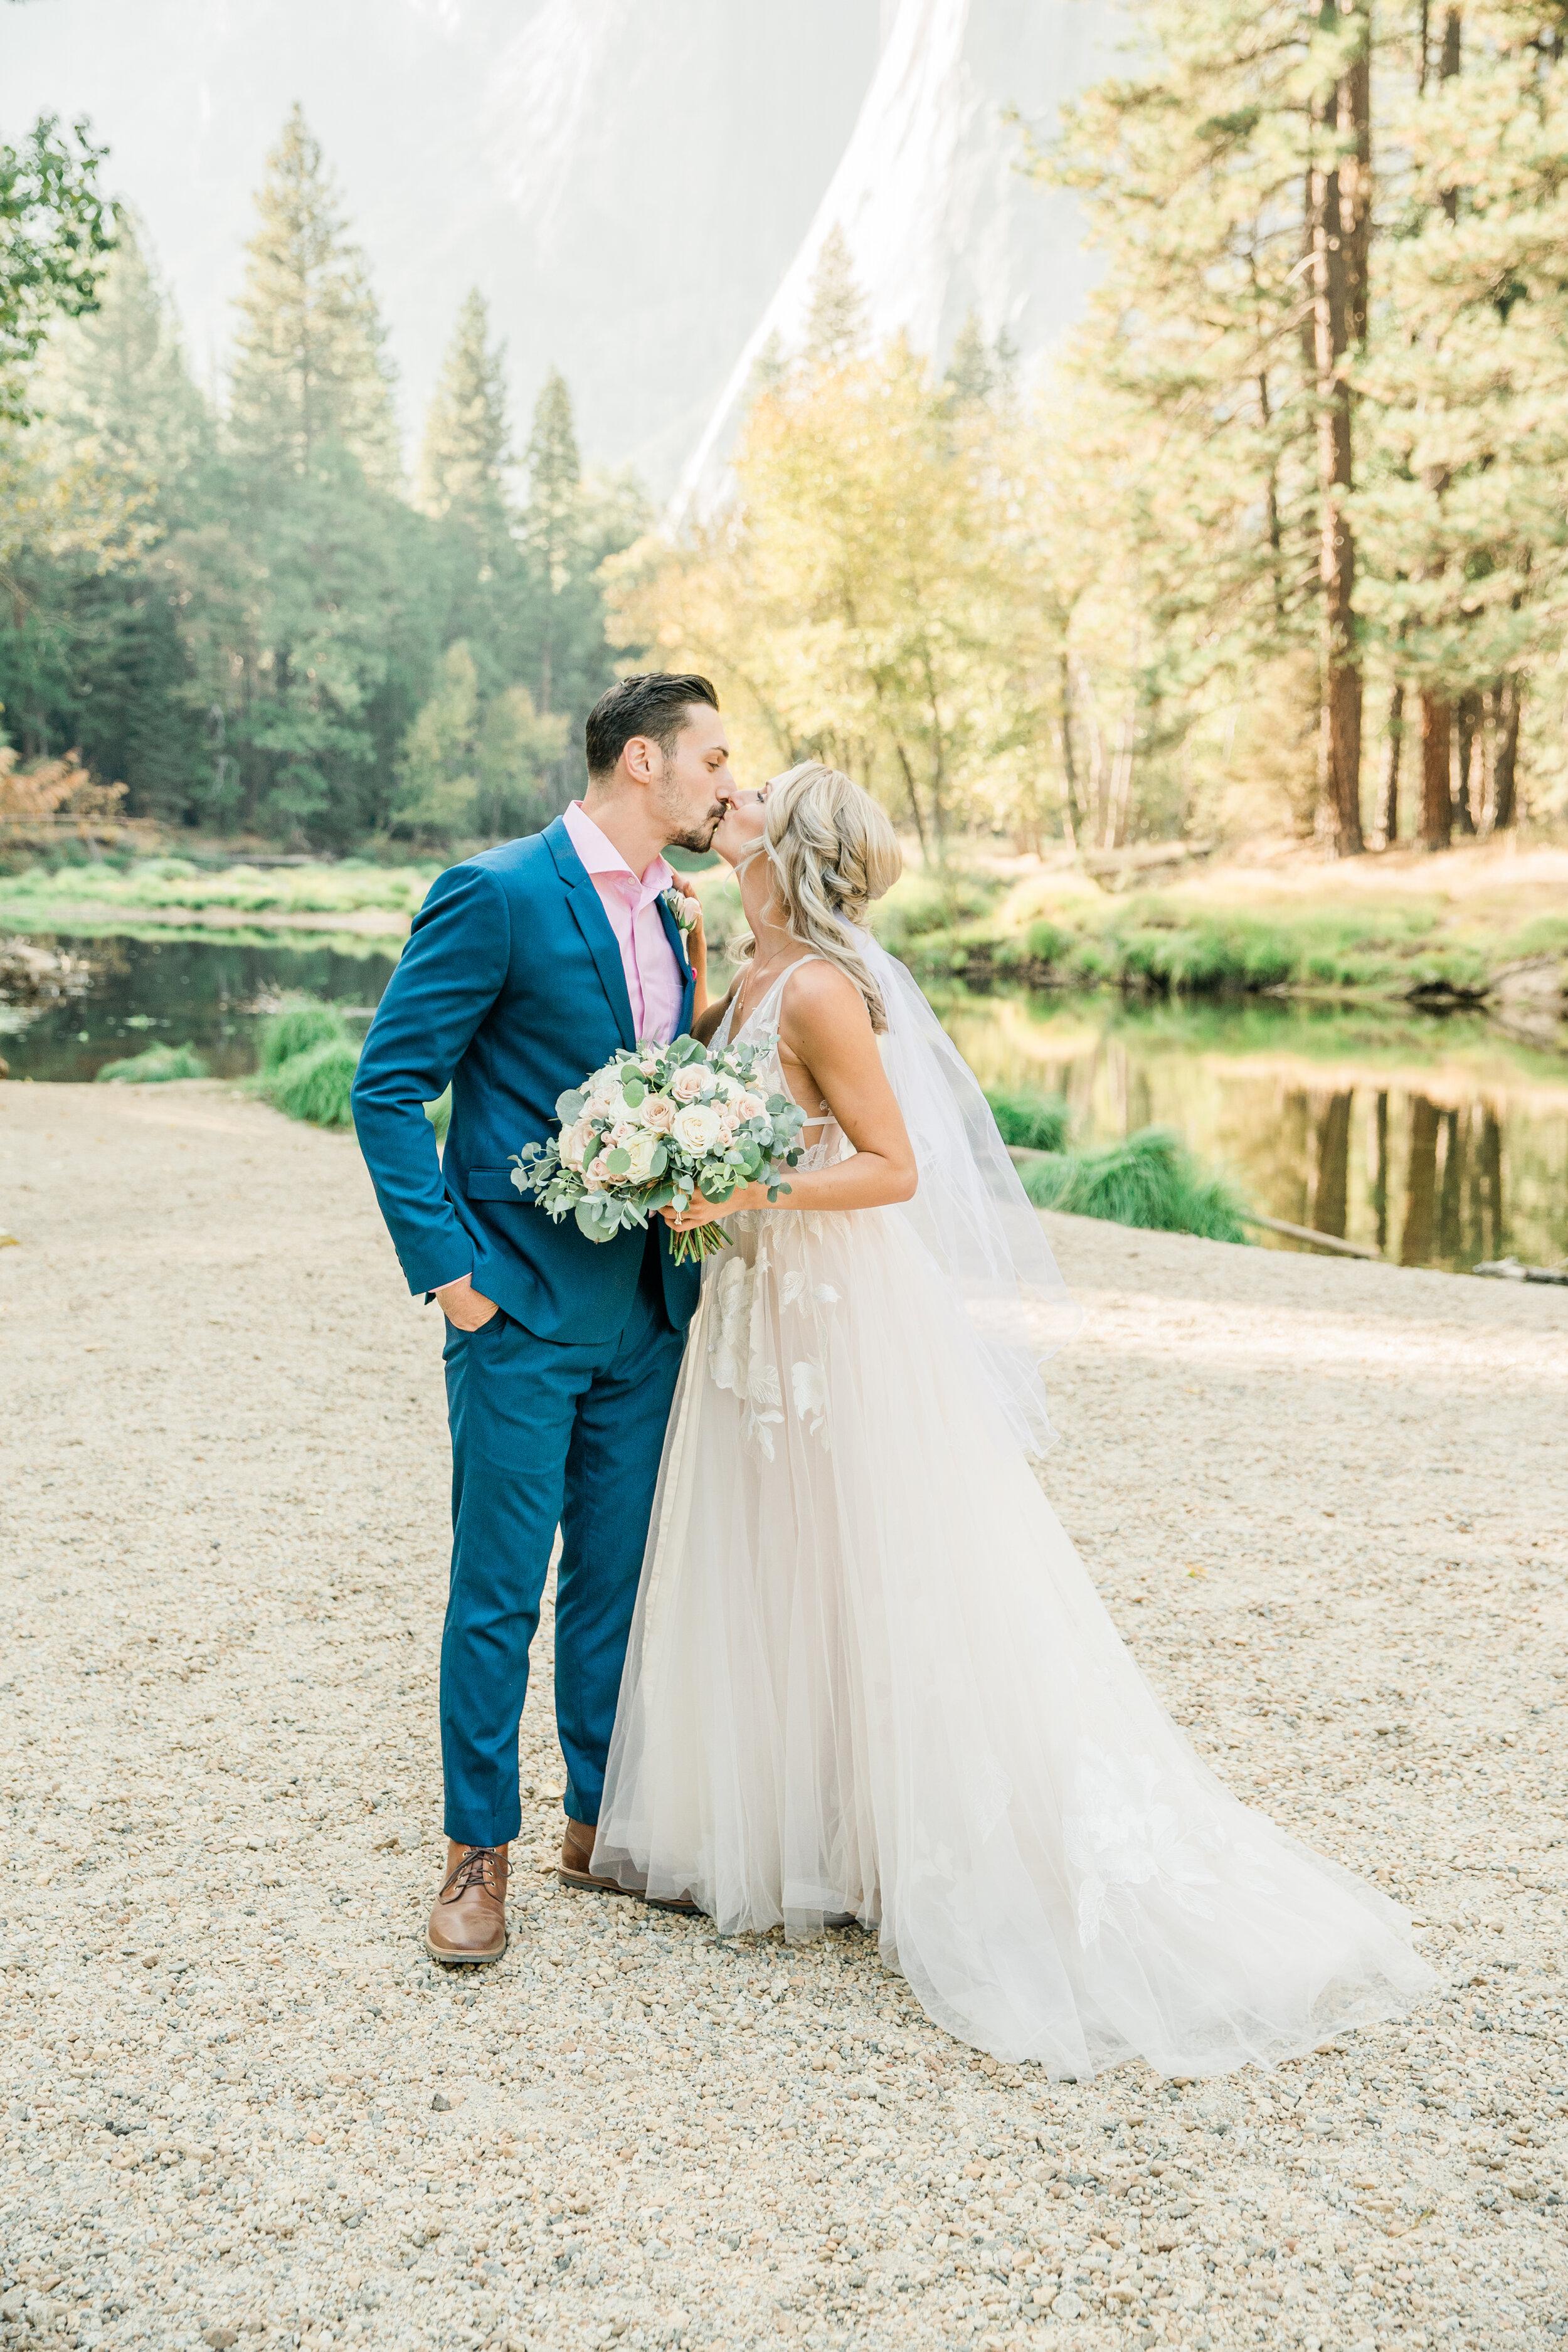 Leanne and Joe - Married - Sneak Peeks - Lauren Alisse Photography-26.jpg